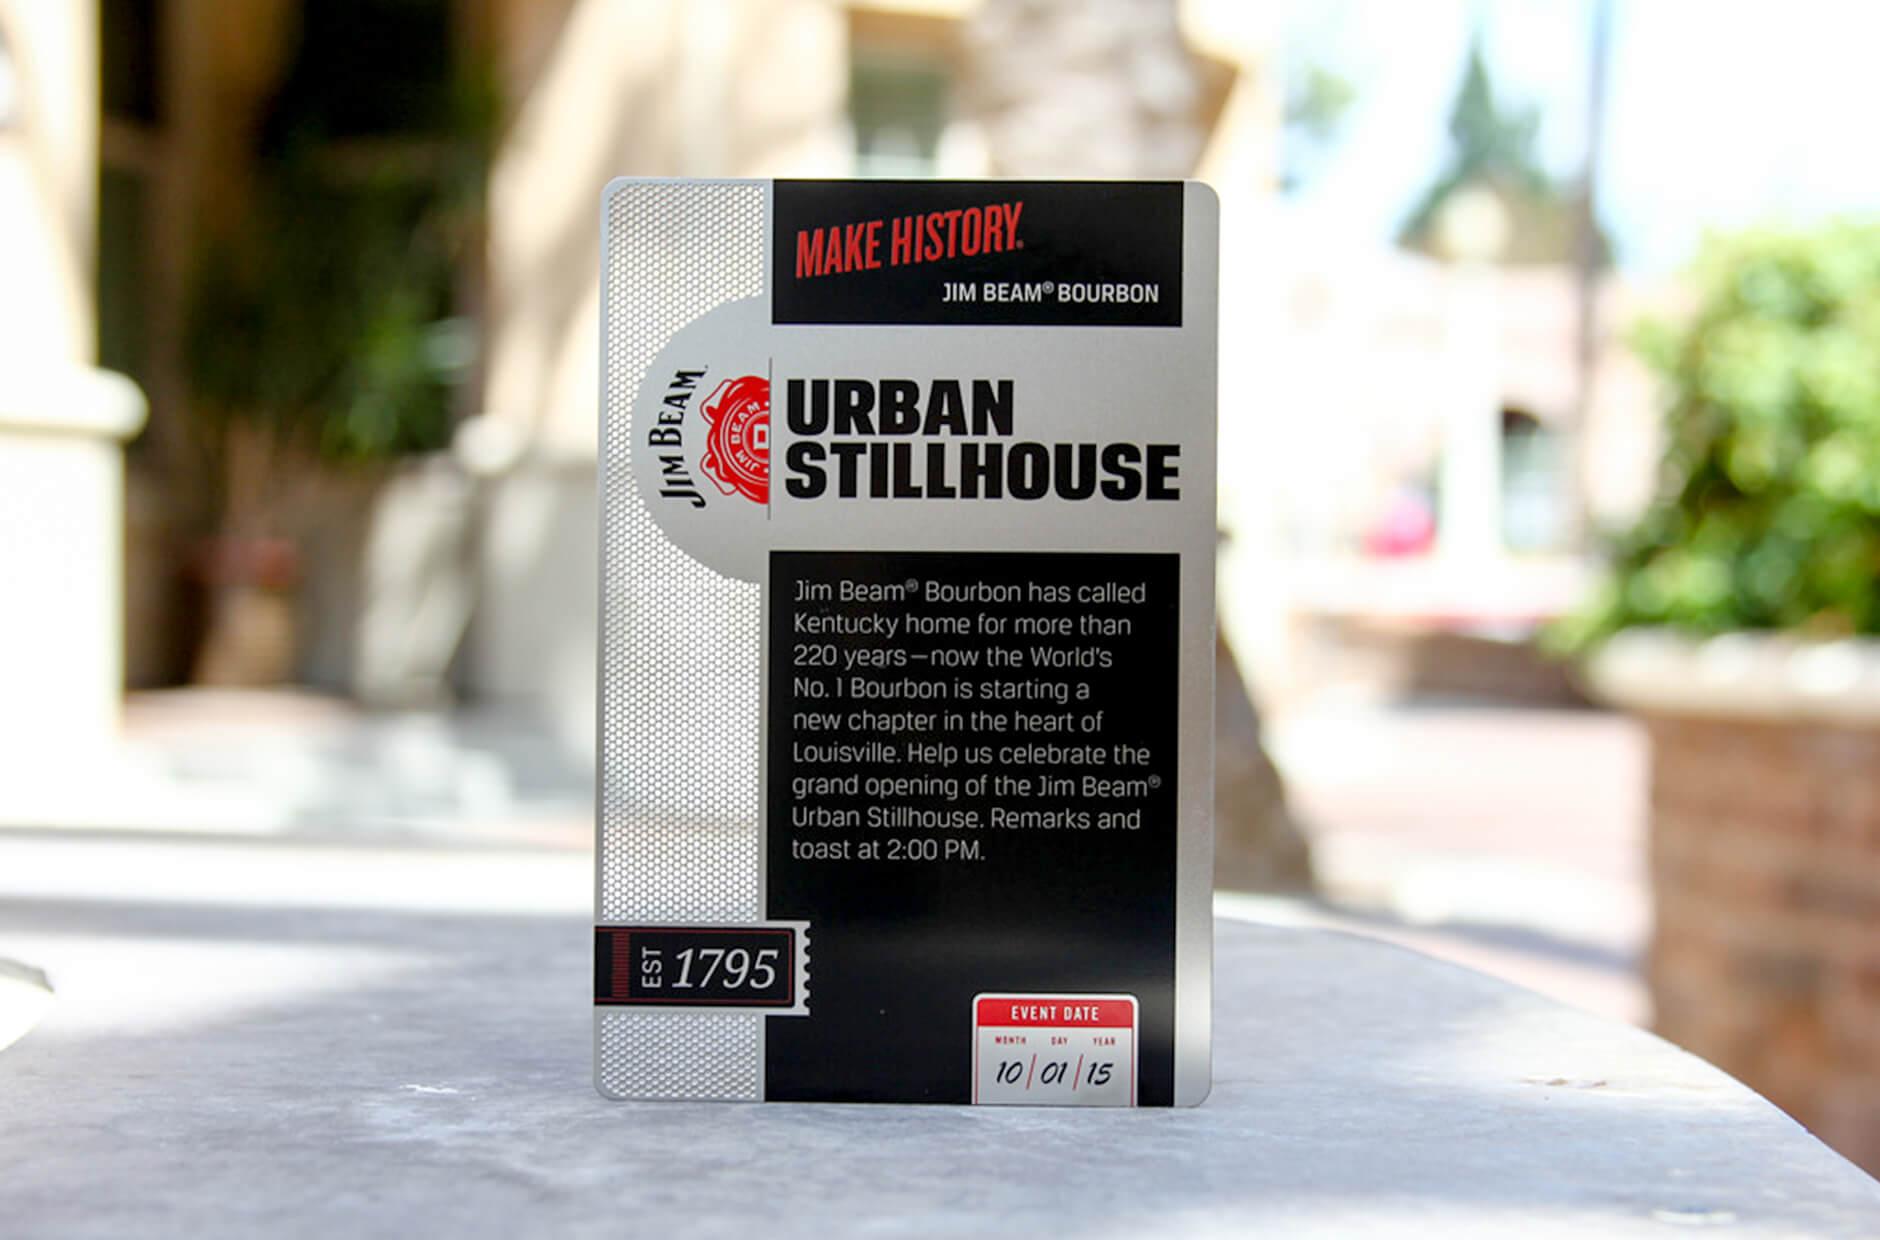 jsha beam urban stillhouse invite front image